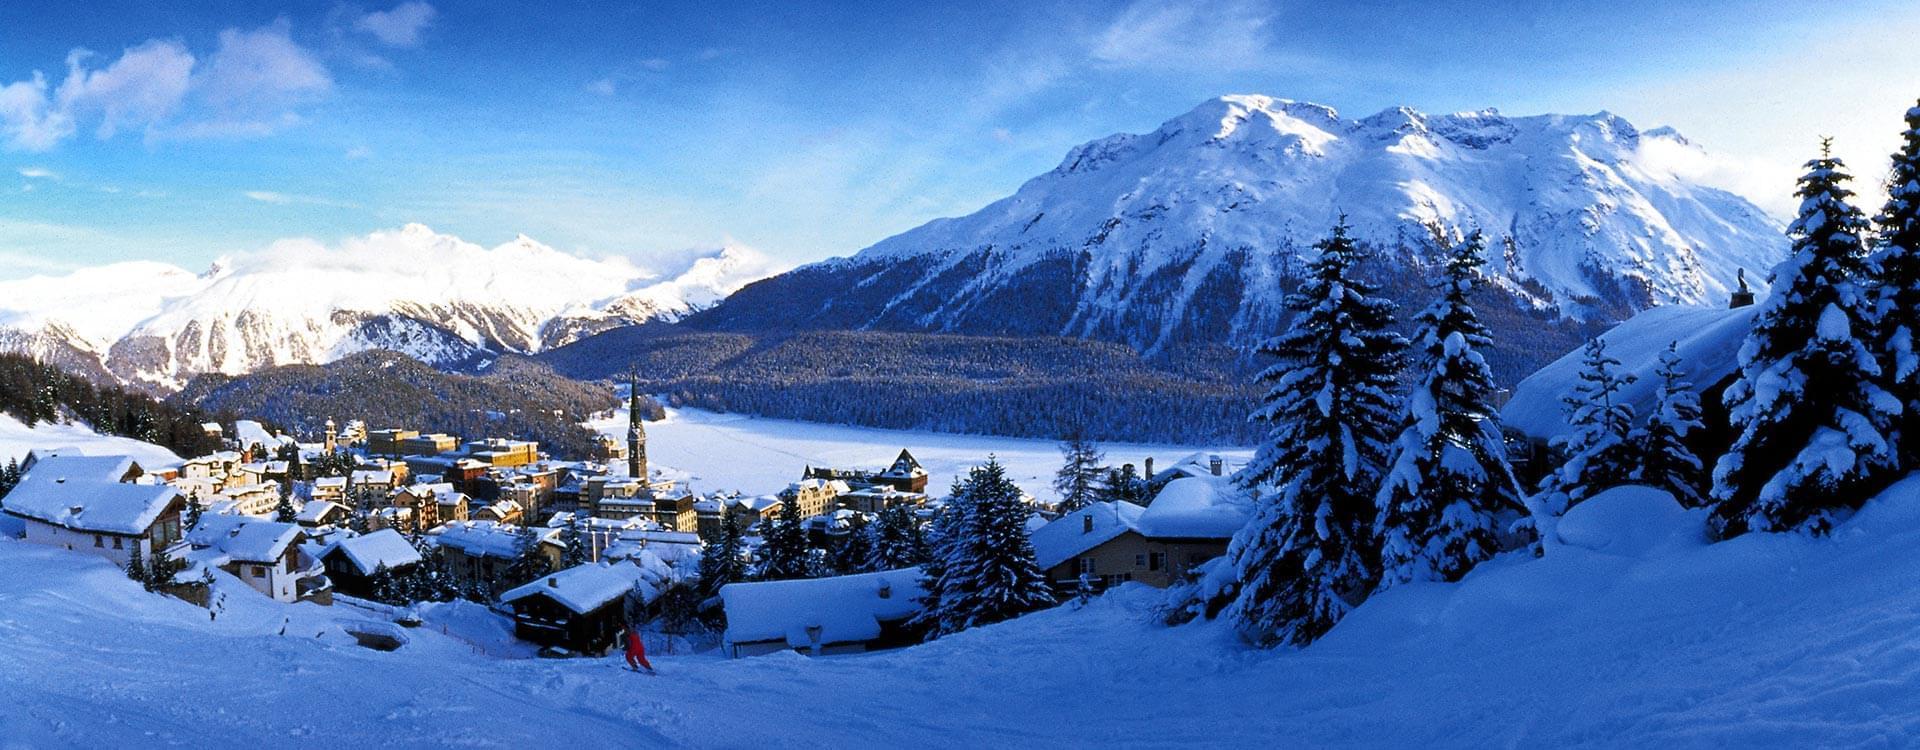 ebe8054b503c5f Ortstext St. Moritz EN Winter   Winter in Engadin St. Moritz